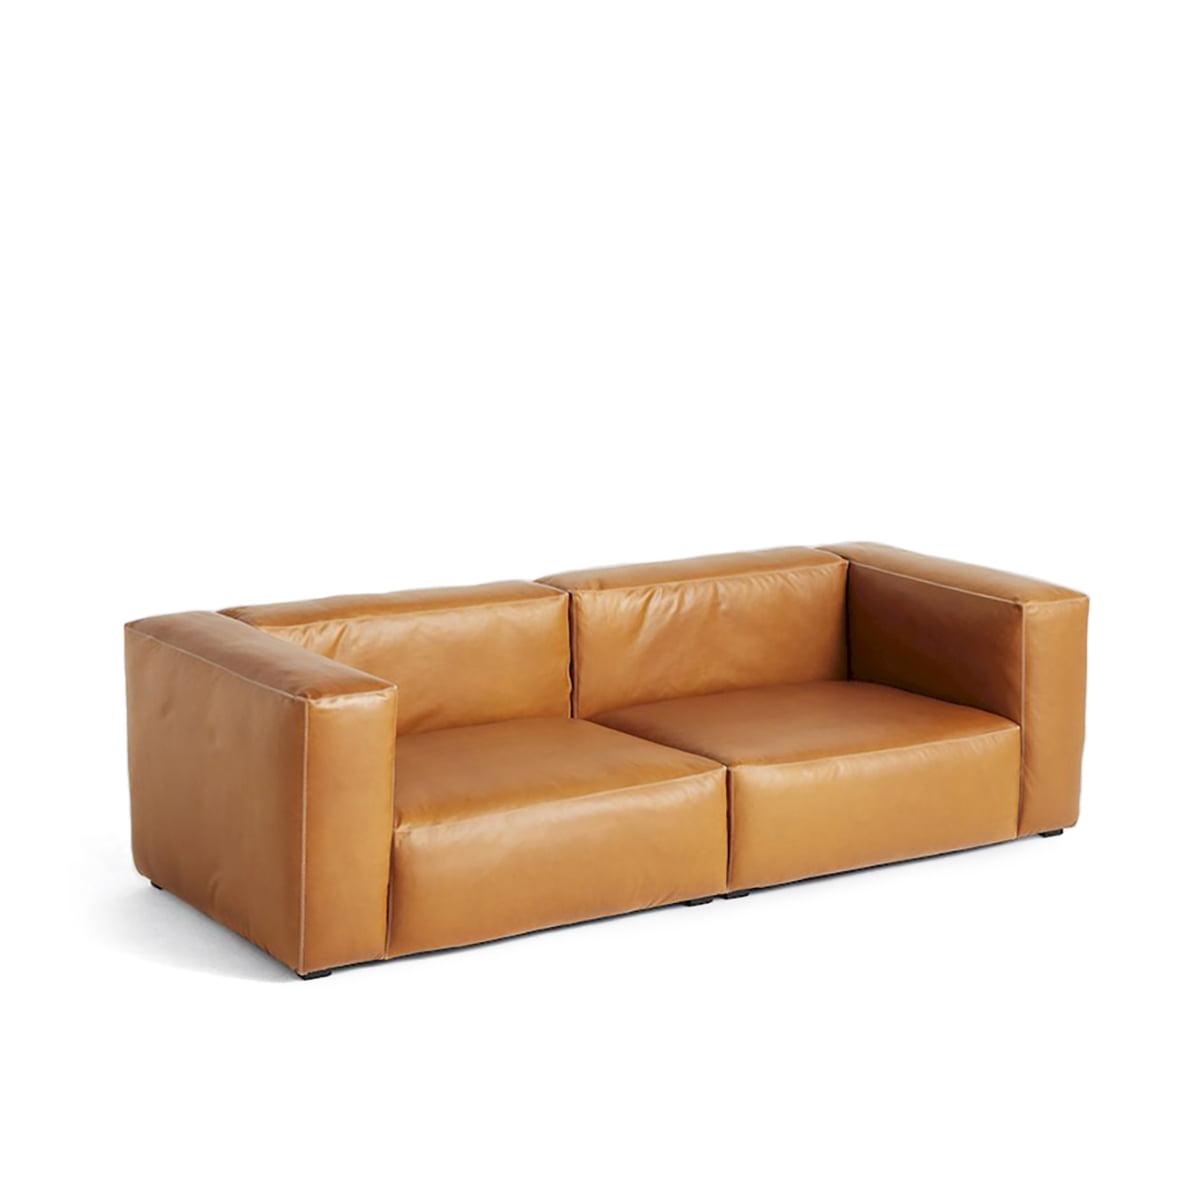 hay sofa mags leder big lots sleeper cognac 2 and 3 sitzer sofas online kaufen möbel